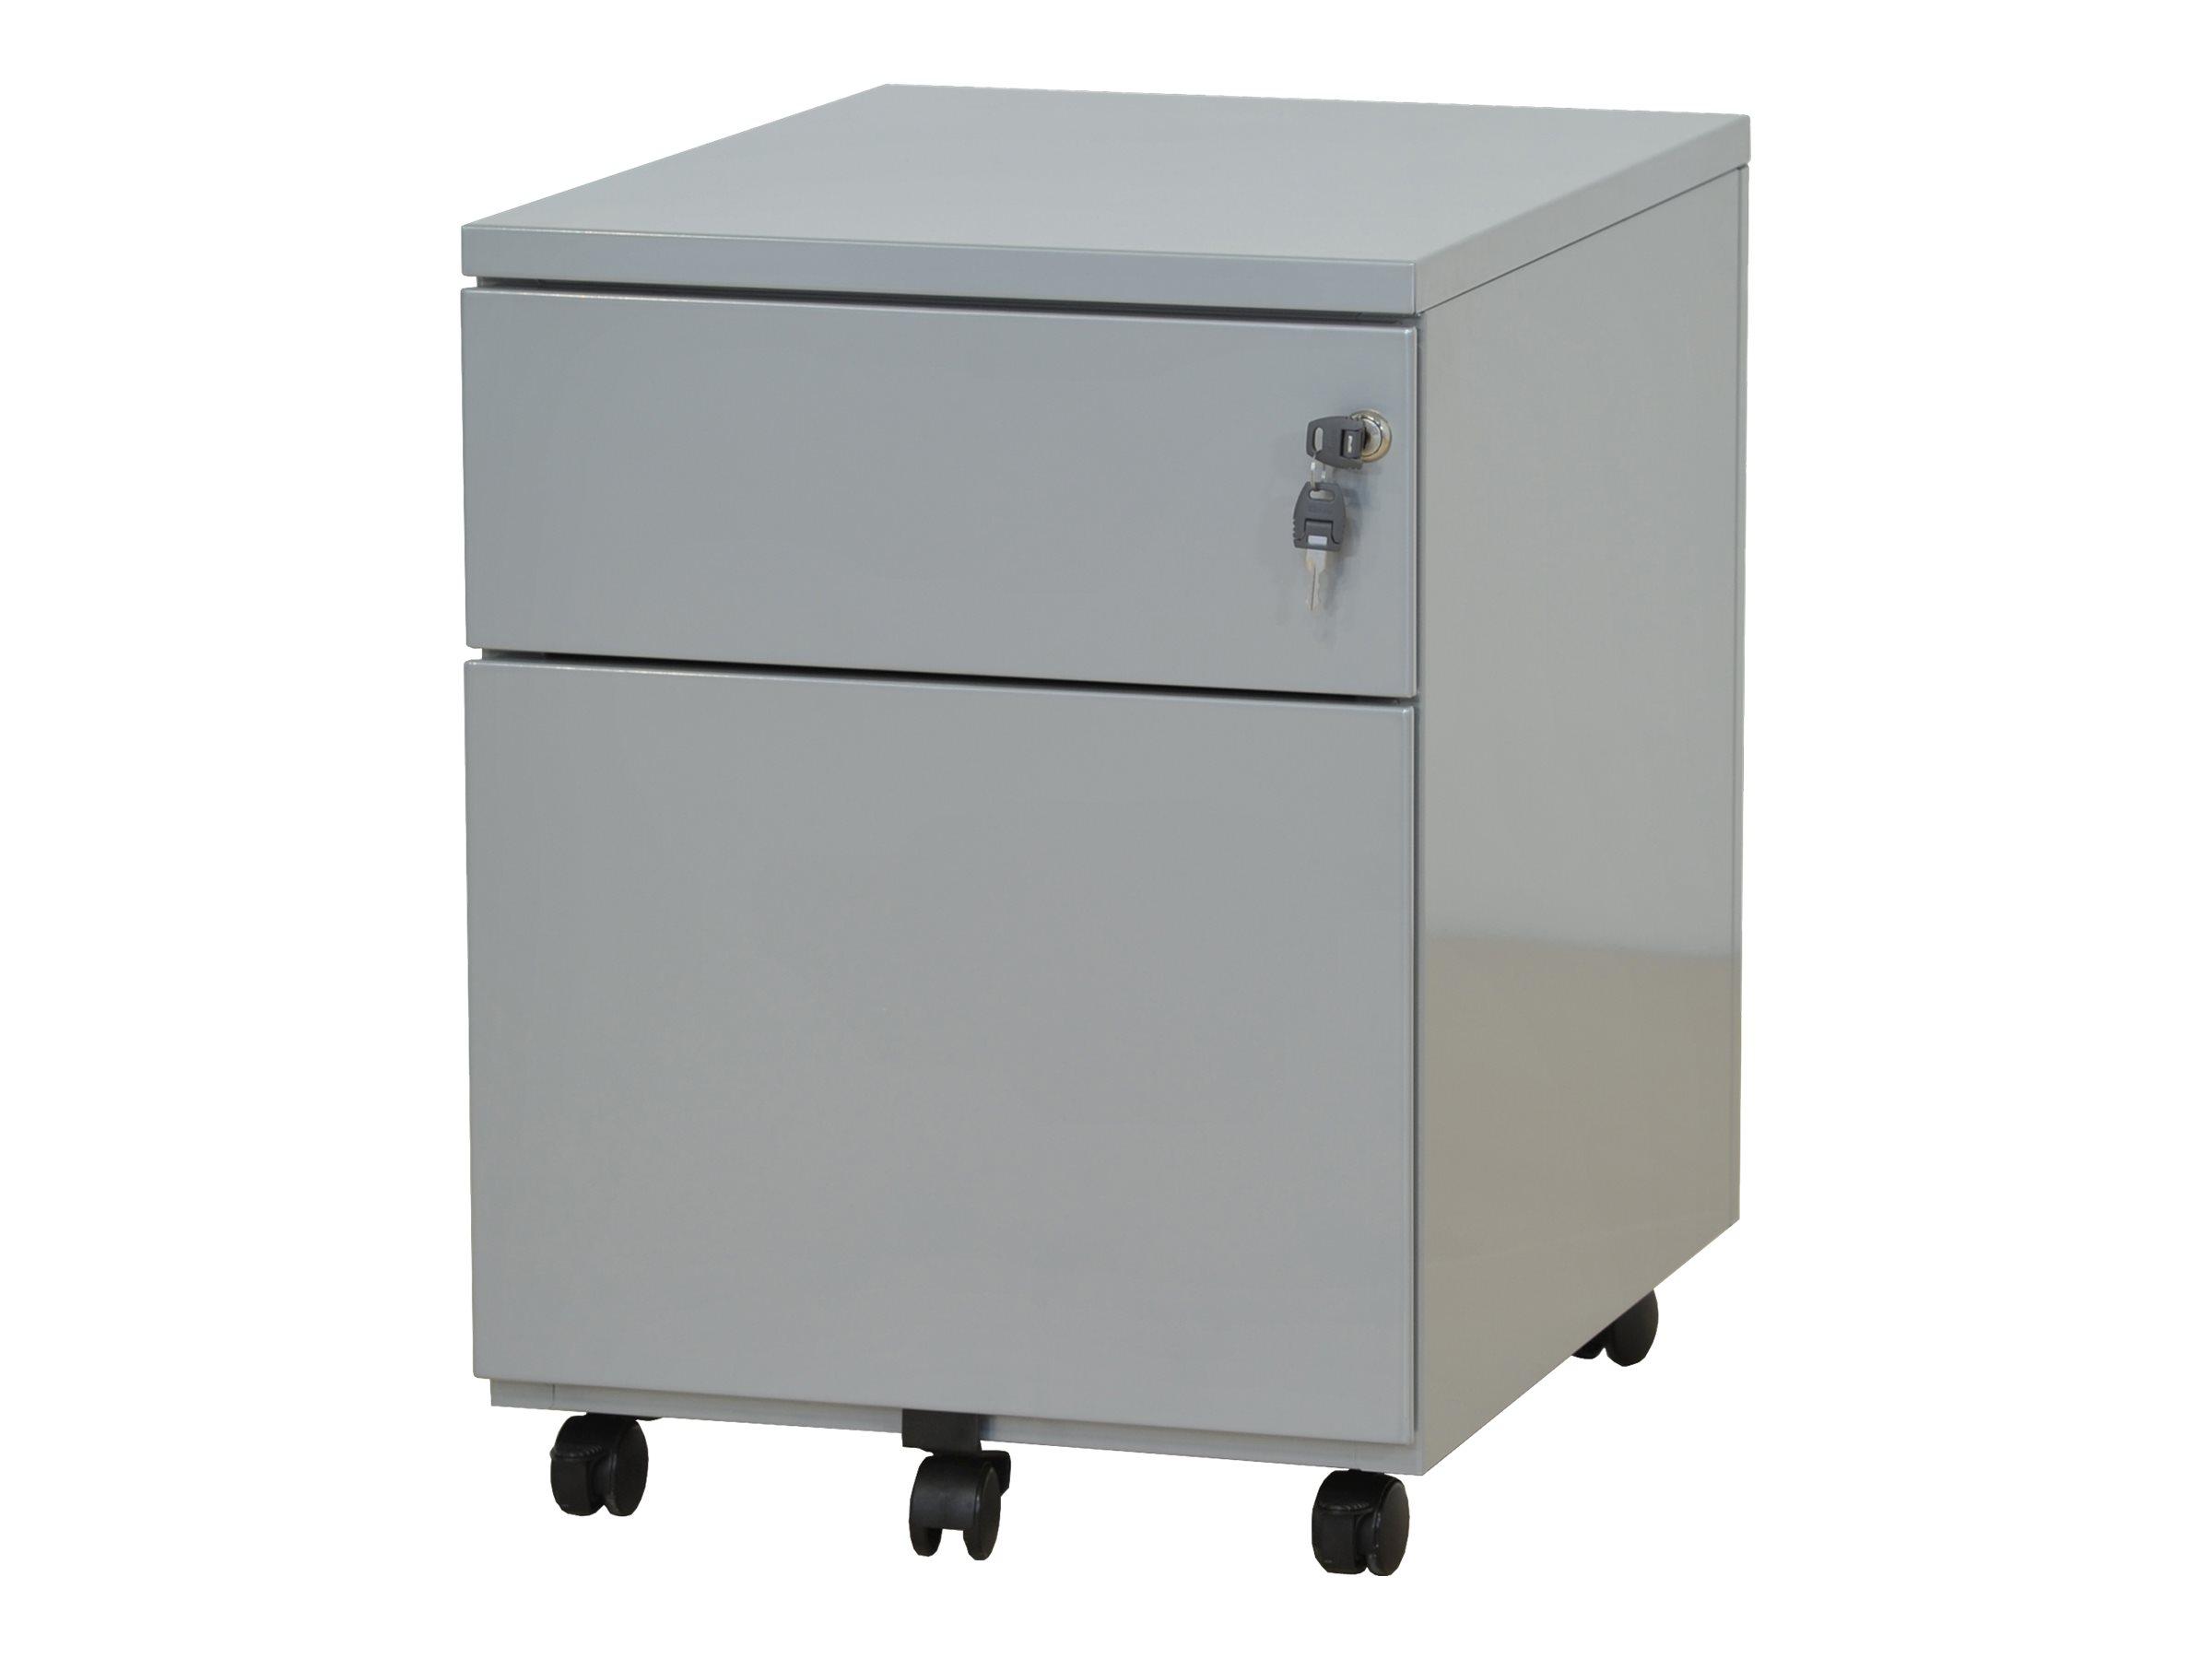 Caisson mobile - 2 tiroirs - aluminium - 56,7 x 54,1 x 41,8 cm